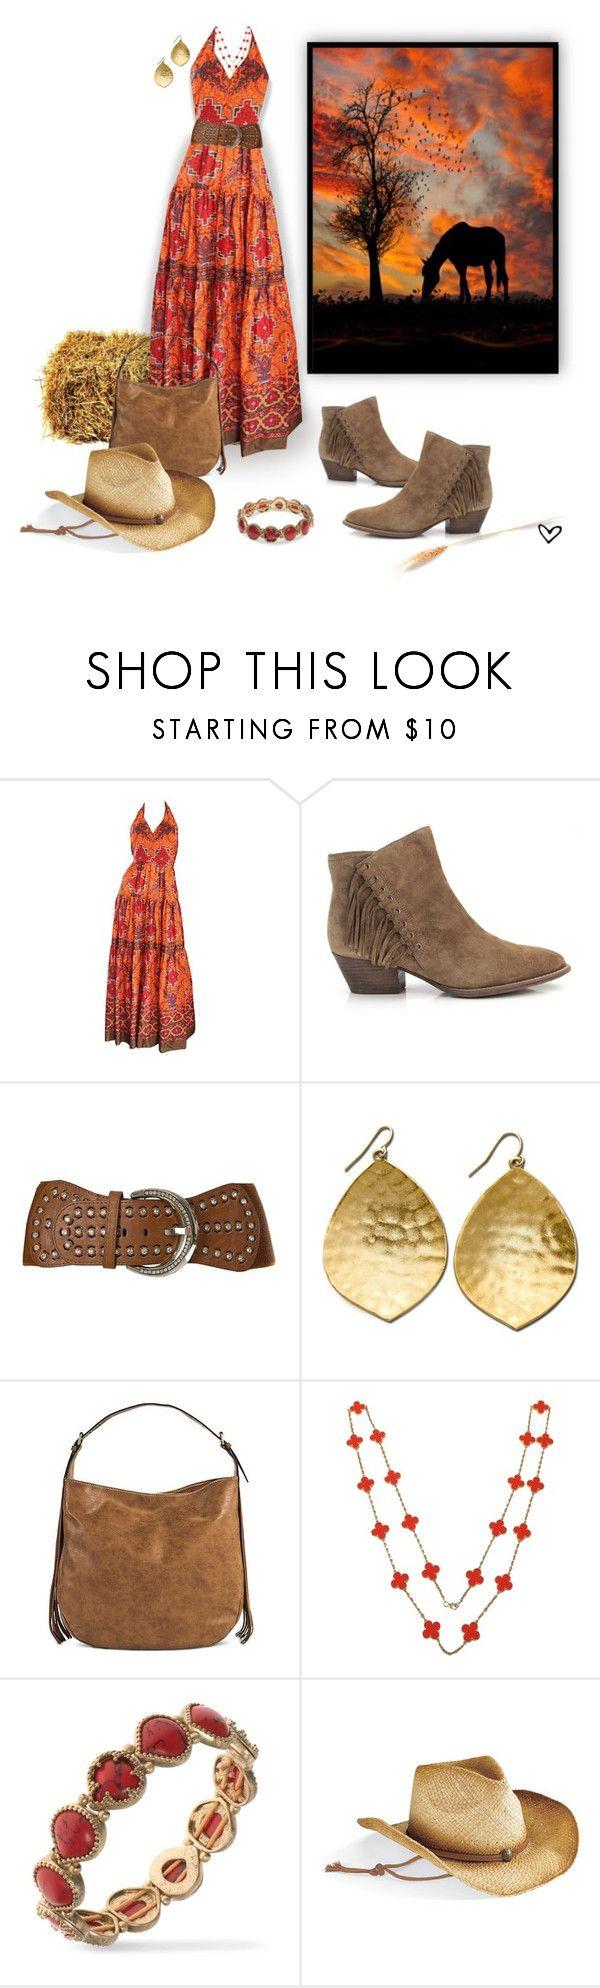 """~Cowgirl-Up~"" by justwanderingon ❤ liked on Polyvore featuring Frank Usher, Ash, Angel Ranch, Lauren Ralph Lauren, Merona, Van Cleef & Arpels, Vintage America and tribalprint"